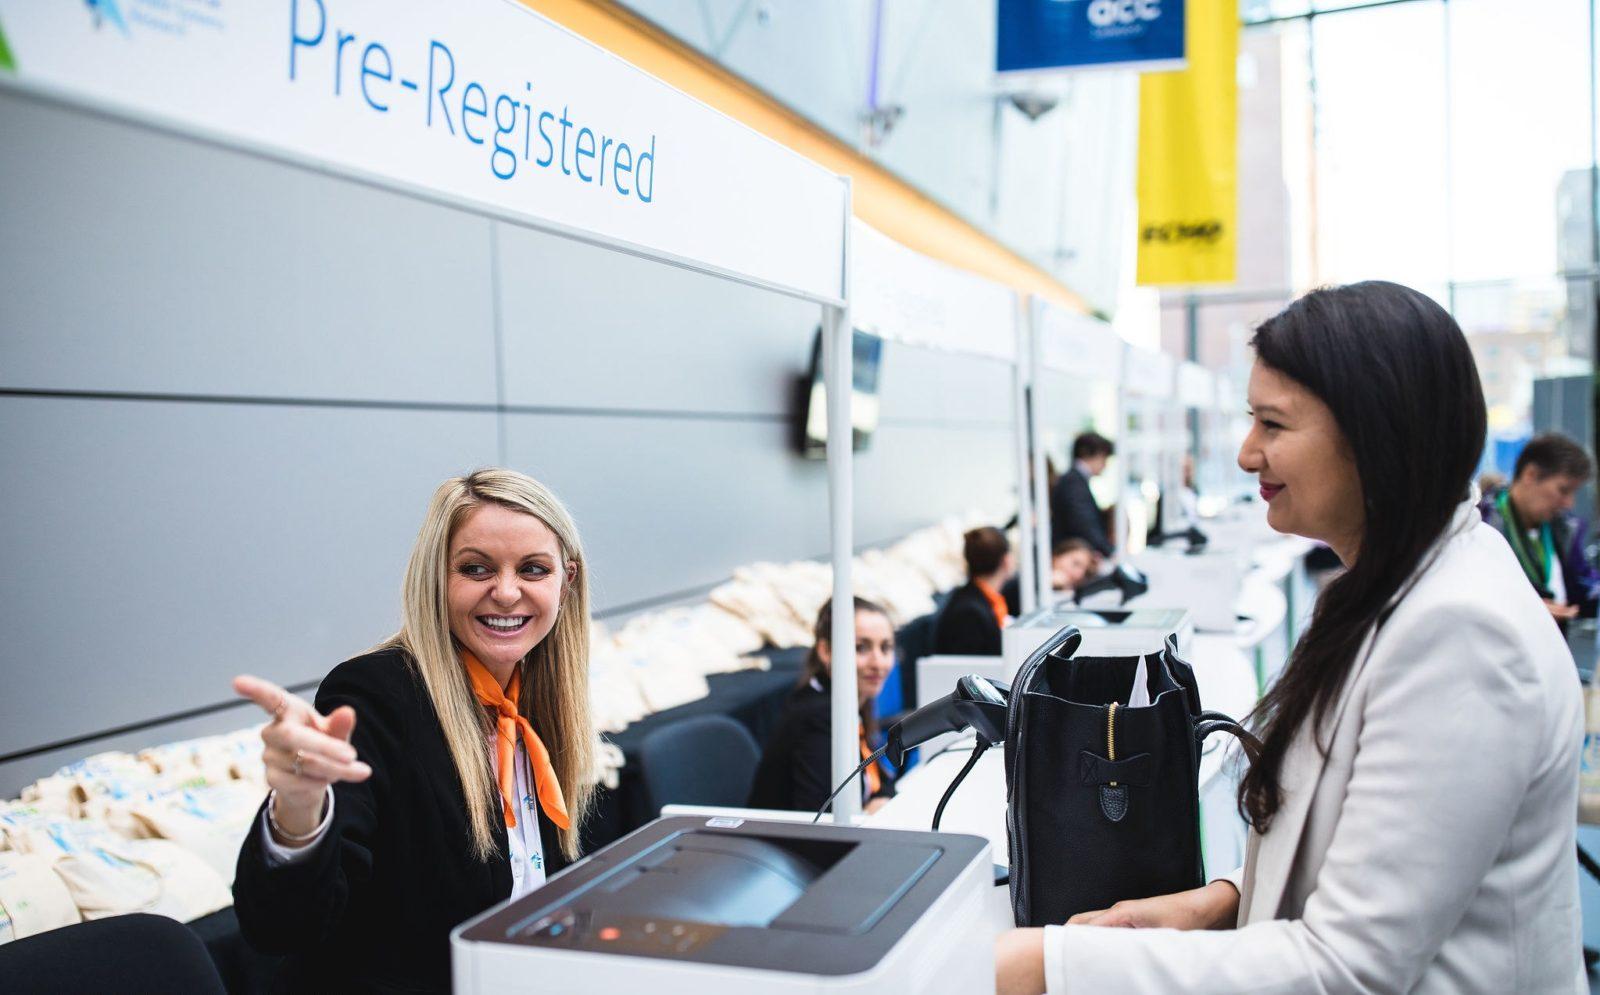 Woman registering at HSR2018 registration desk